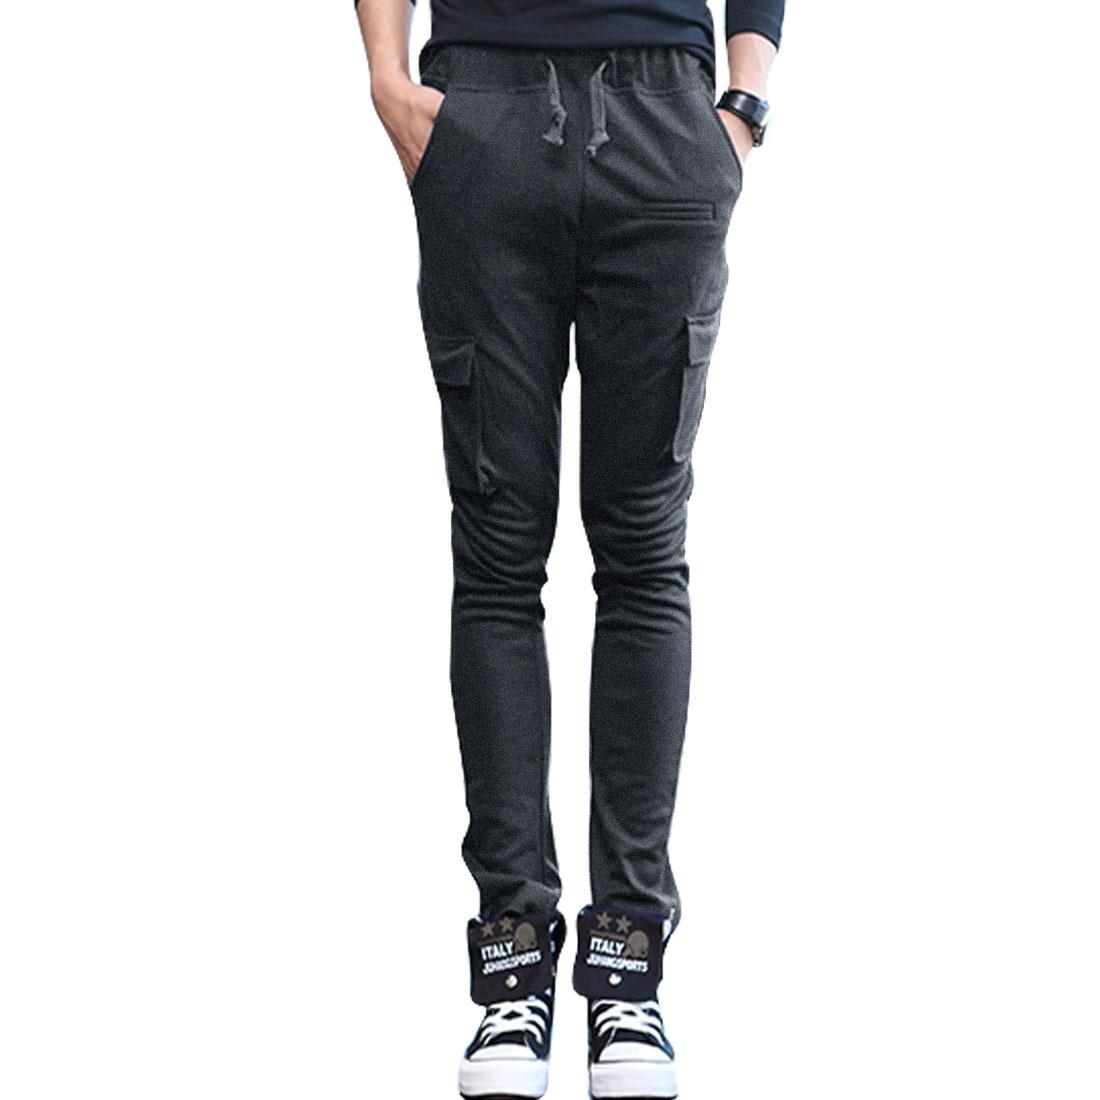 Men Stretchy Waist Straight Legs Slant Pockets Sport Pants Dark Gray W30